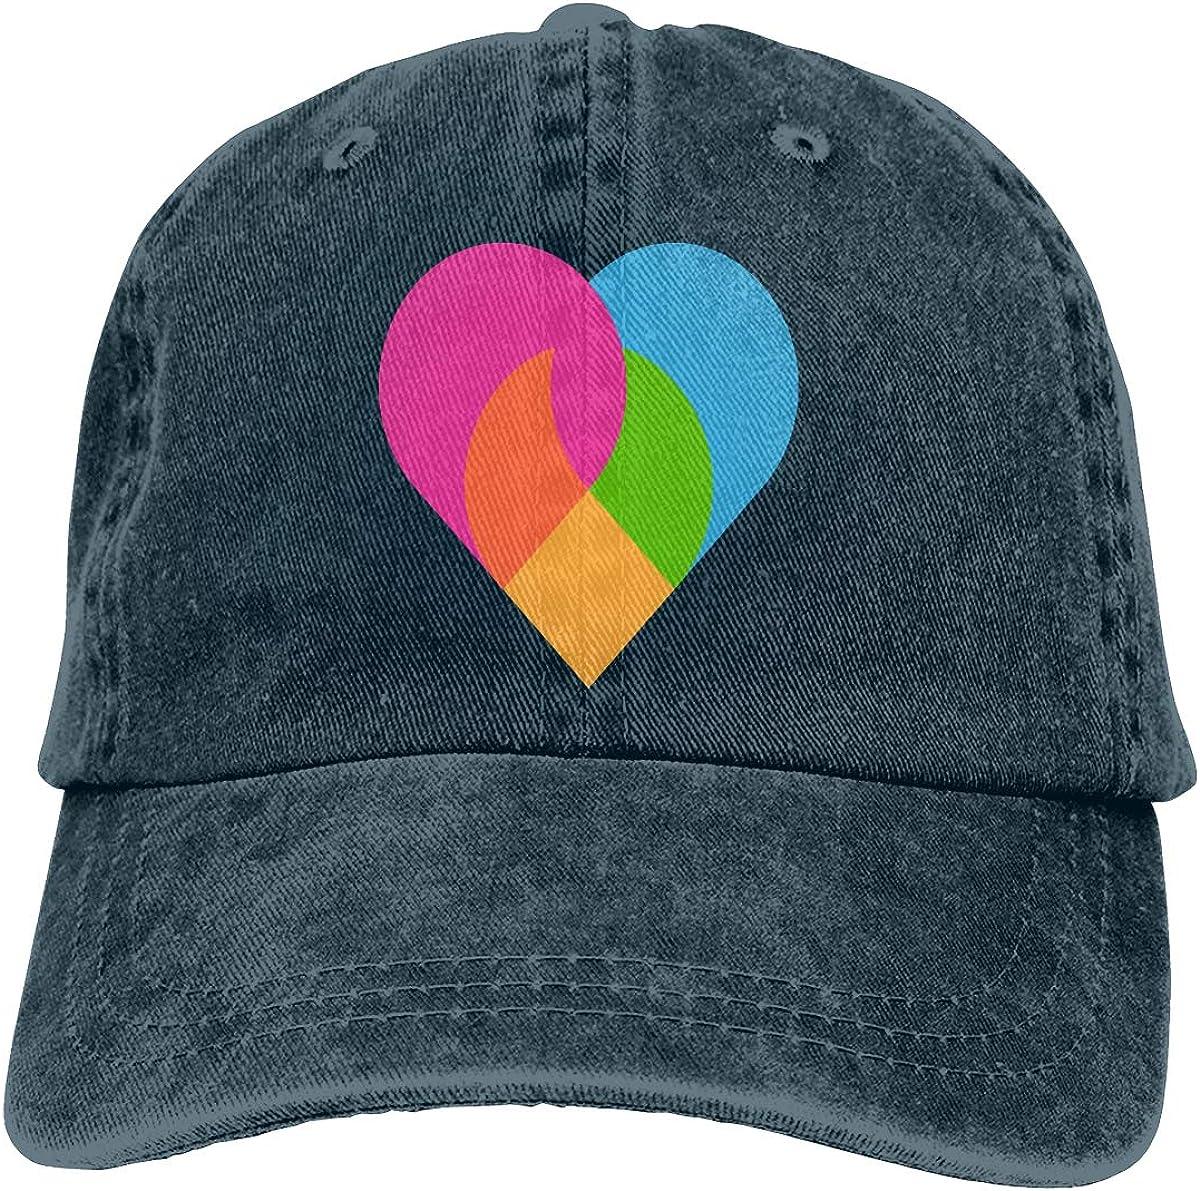 Love Unisex Trendy Cowboy Hat Outdoor Sports Hat Adjustable Baseball Cap